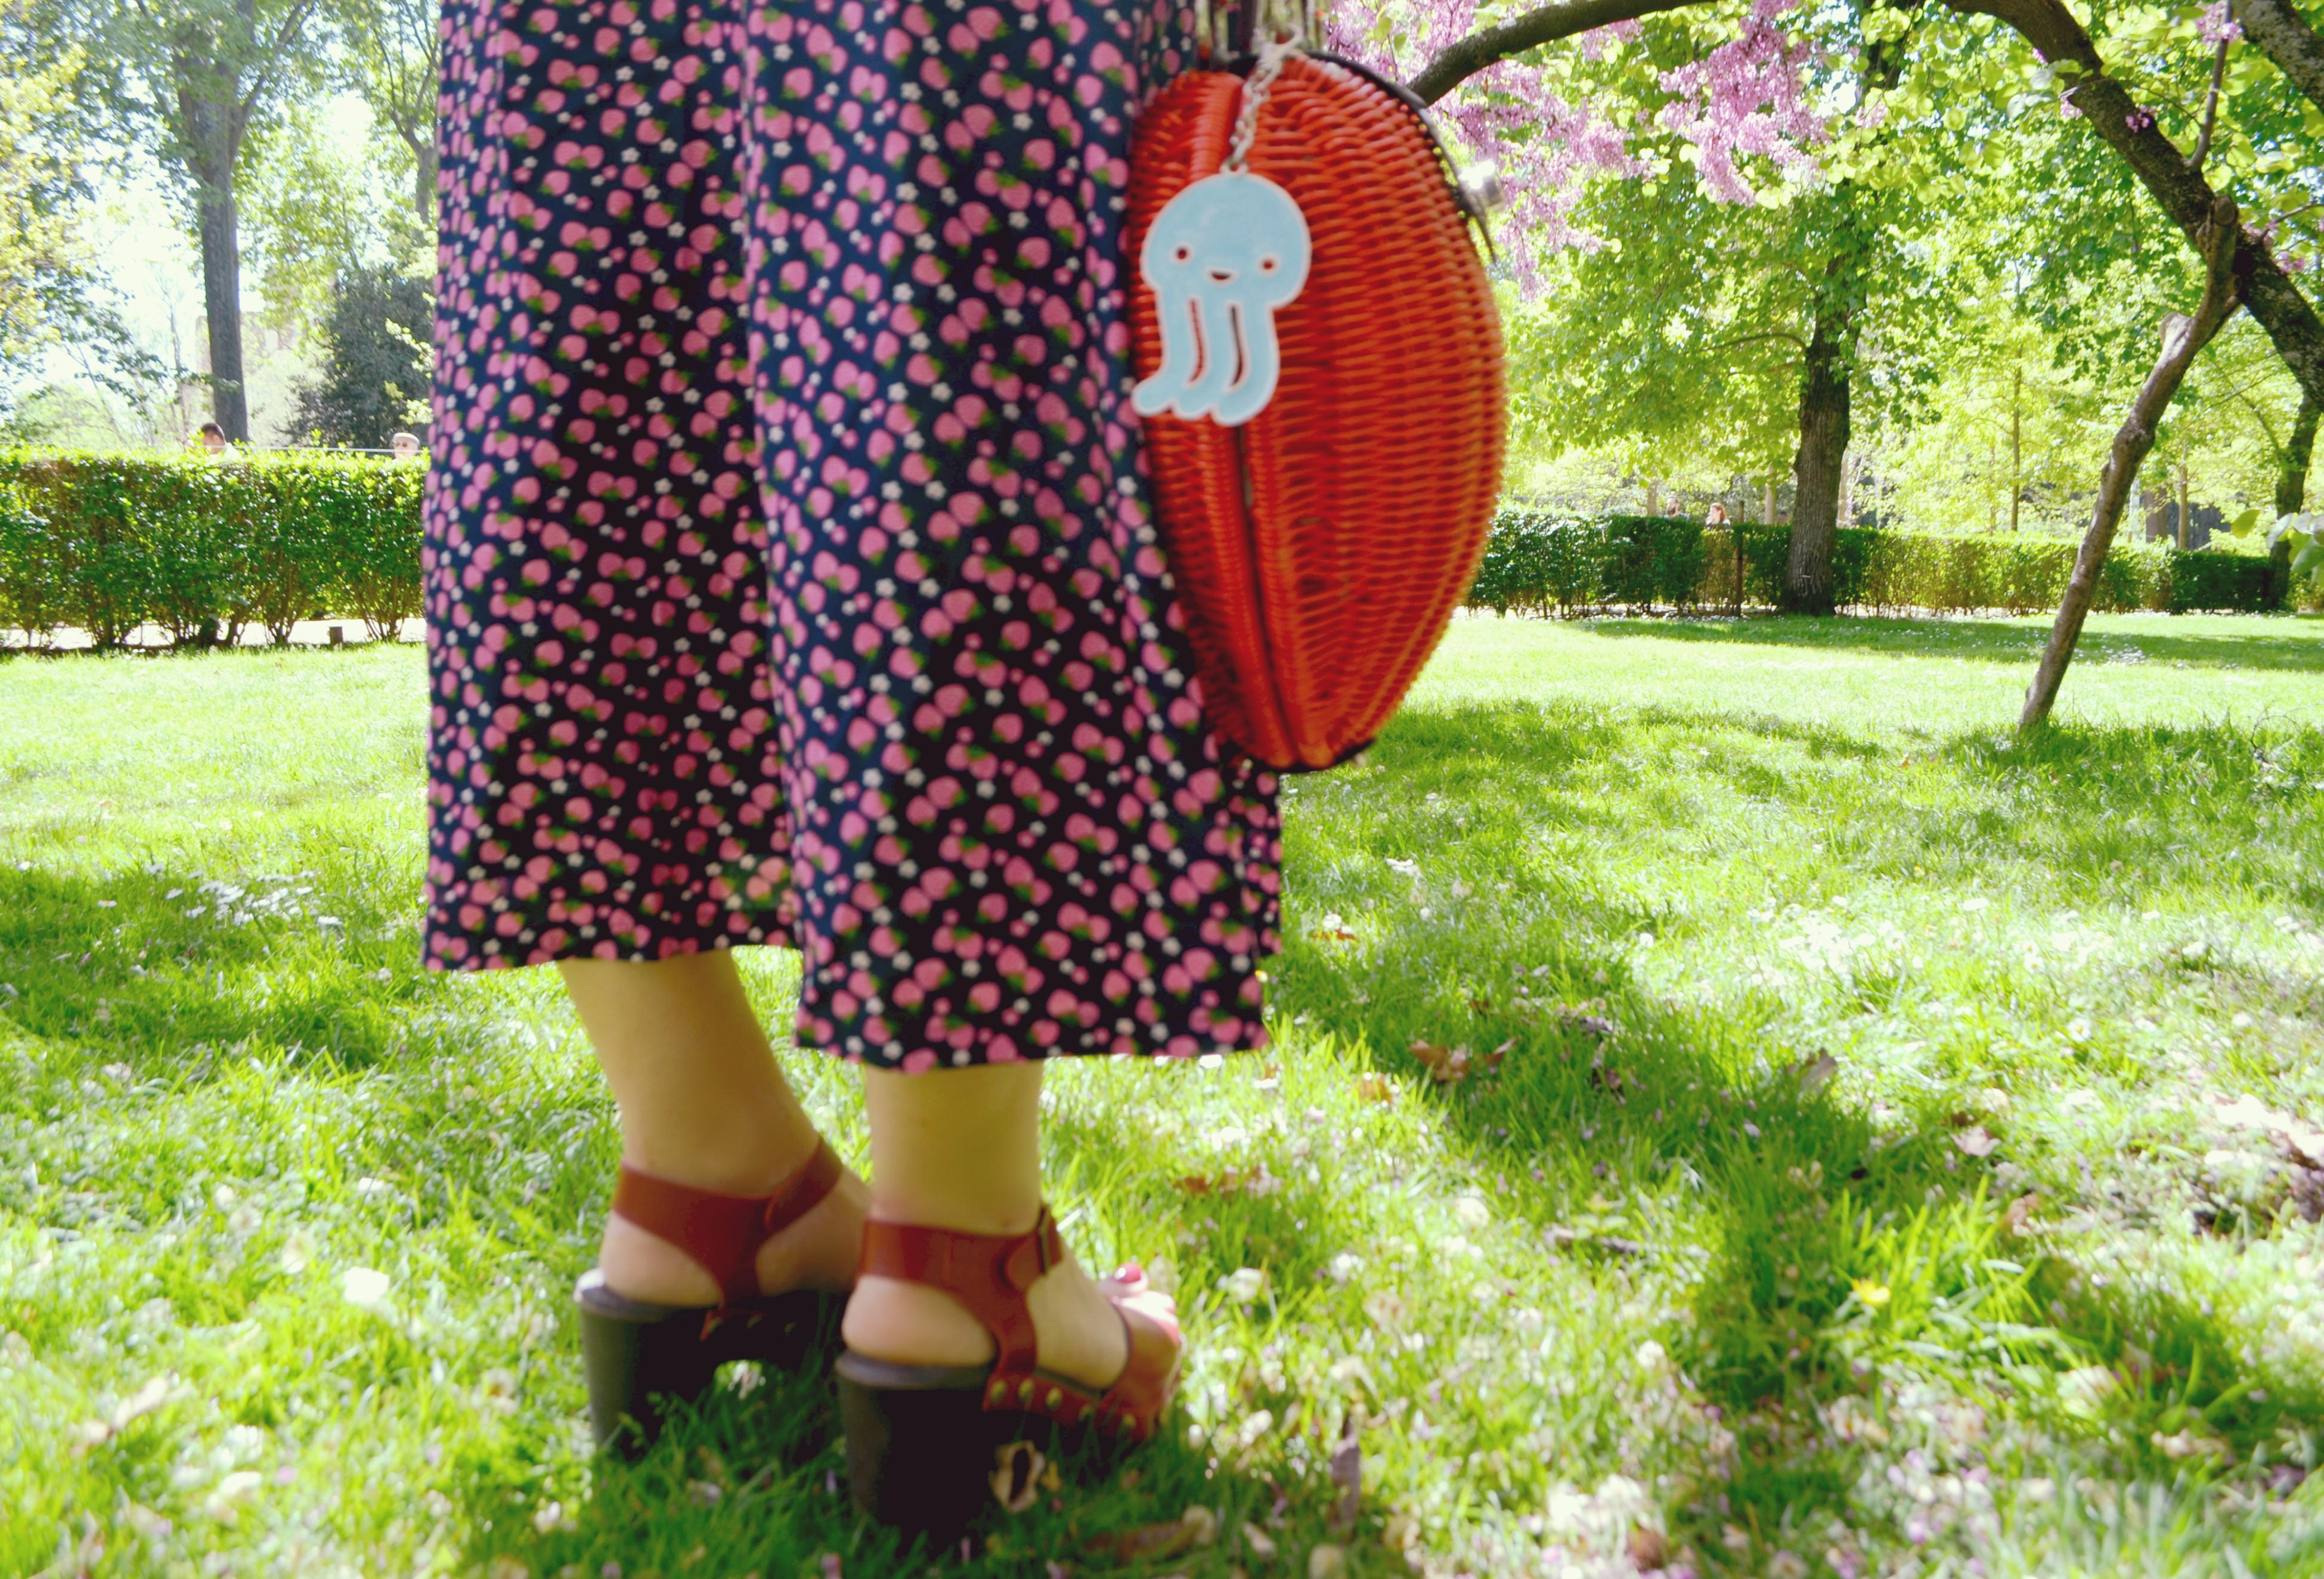 Bolso-kling-blog-de-moda-fashionista-ChicAdicta-sandalias-trakabarraka-Chic-Adicta-vestidos-largos-spring-outfit-influencer-Madrid-PiensaenChic-Piensa-en-Chic